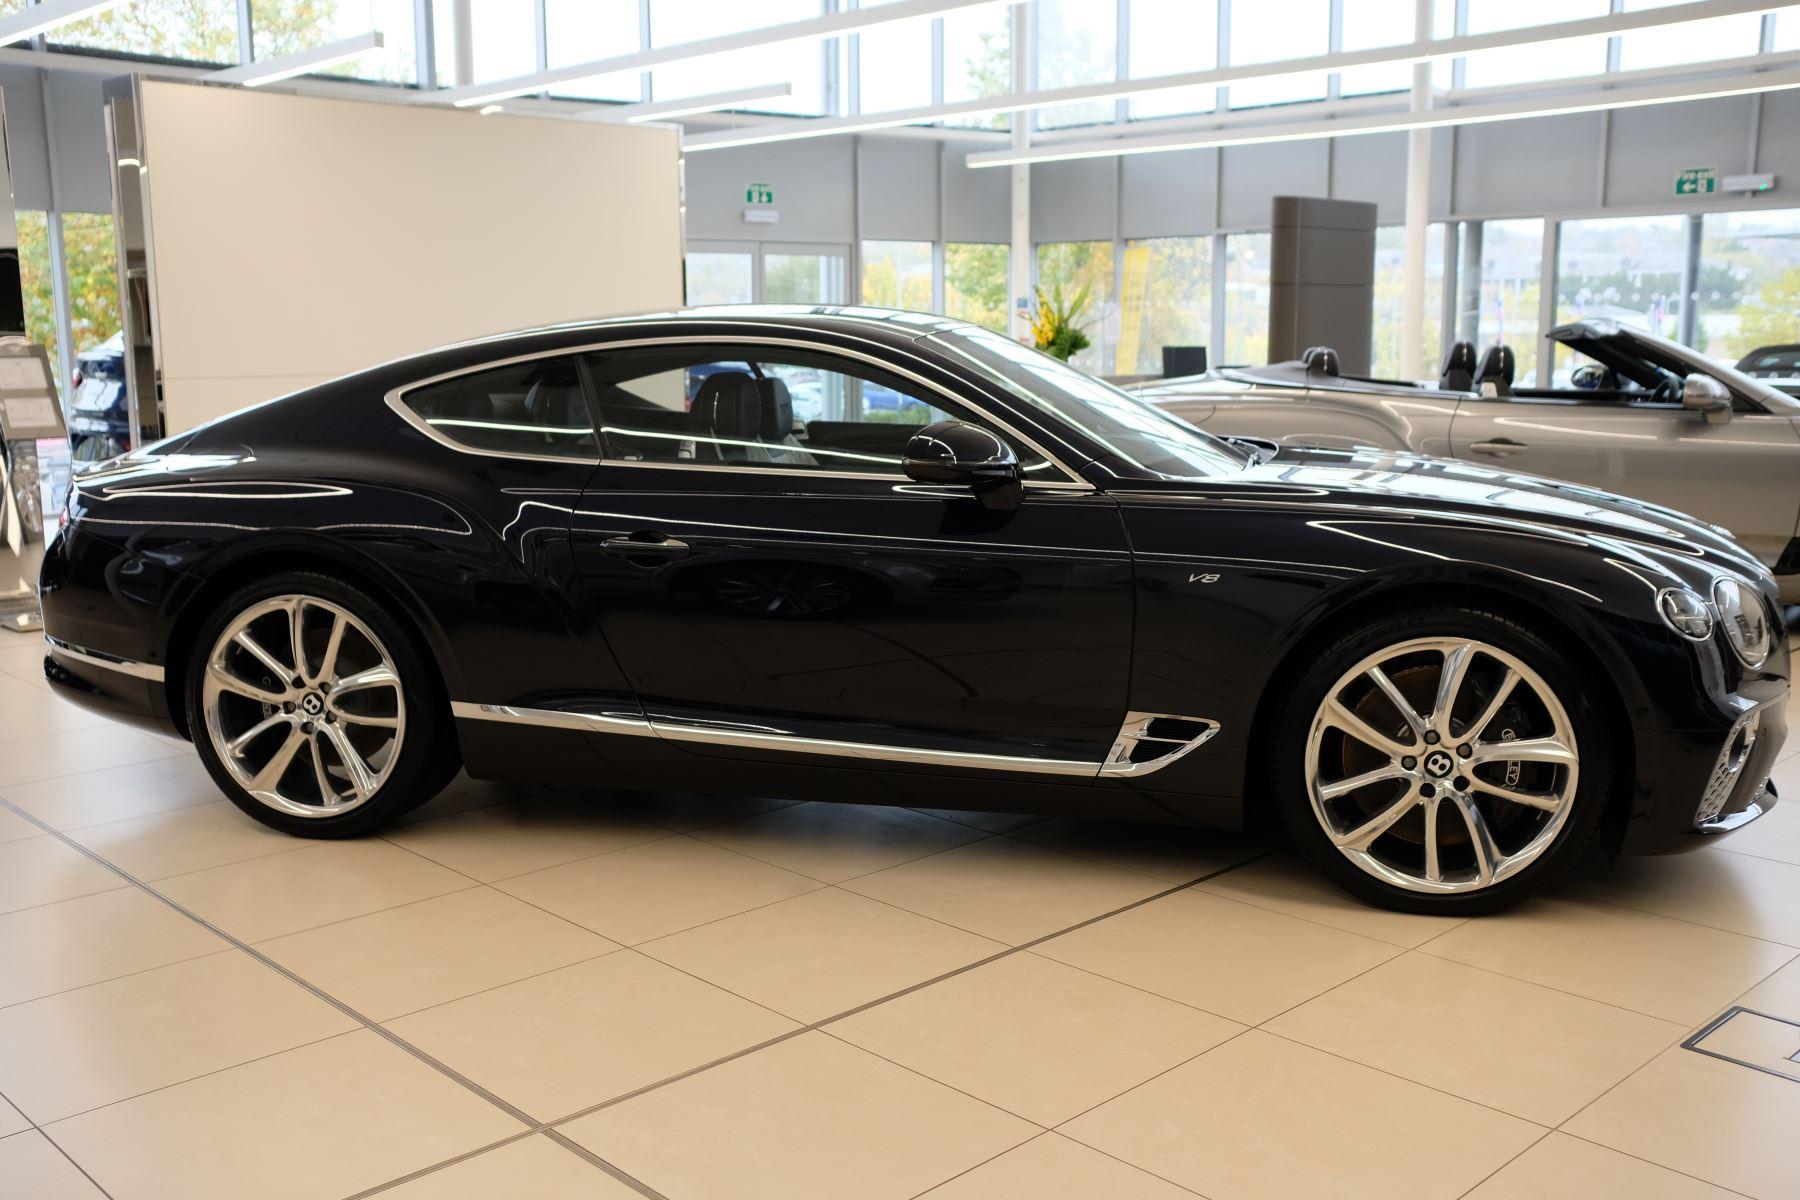 Bentley Continental GT 4.0 V8 Mulliner Edition Auto [Tour Spec] image 3